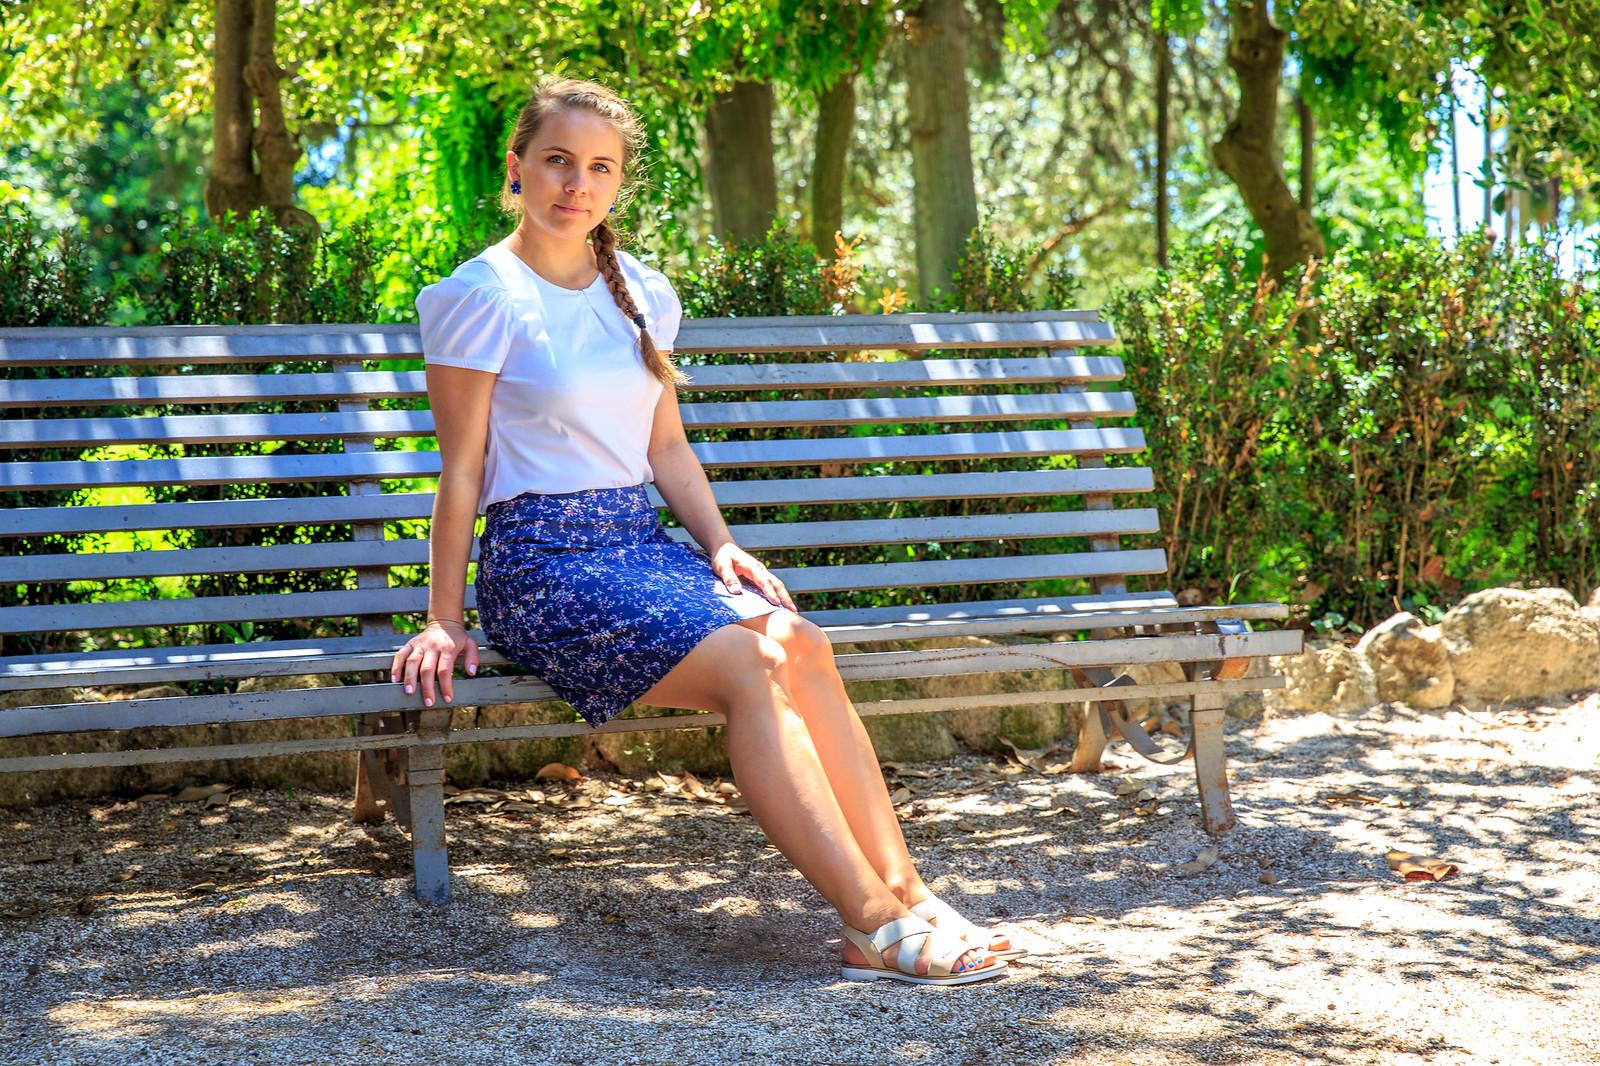 Jeans spódnica, szycie krok po kroku